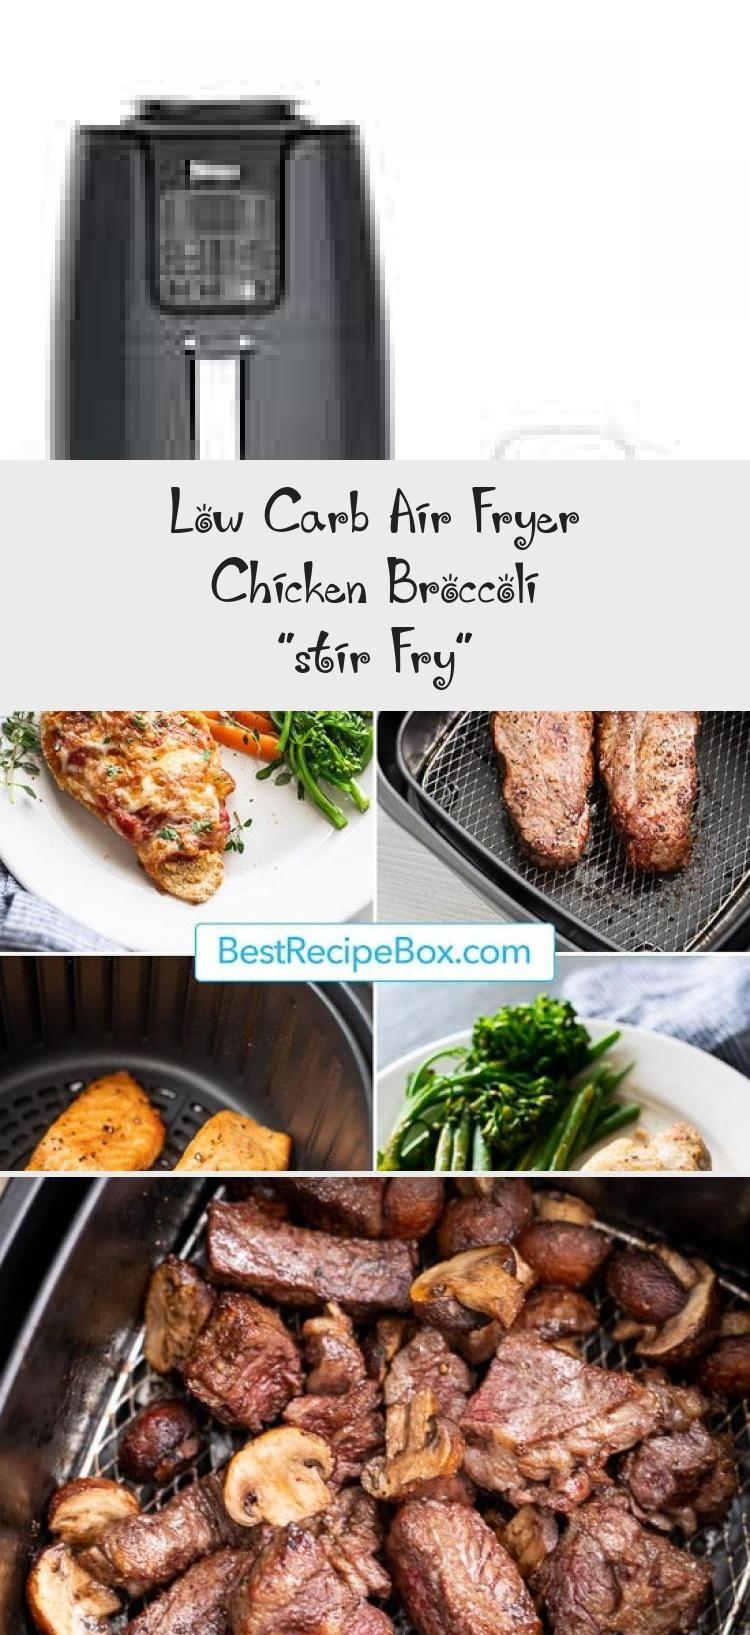 "Low Carb Air Fryer Chicken Broccoli ""stir Fry"" Vegetable"